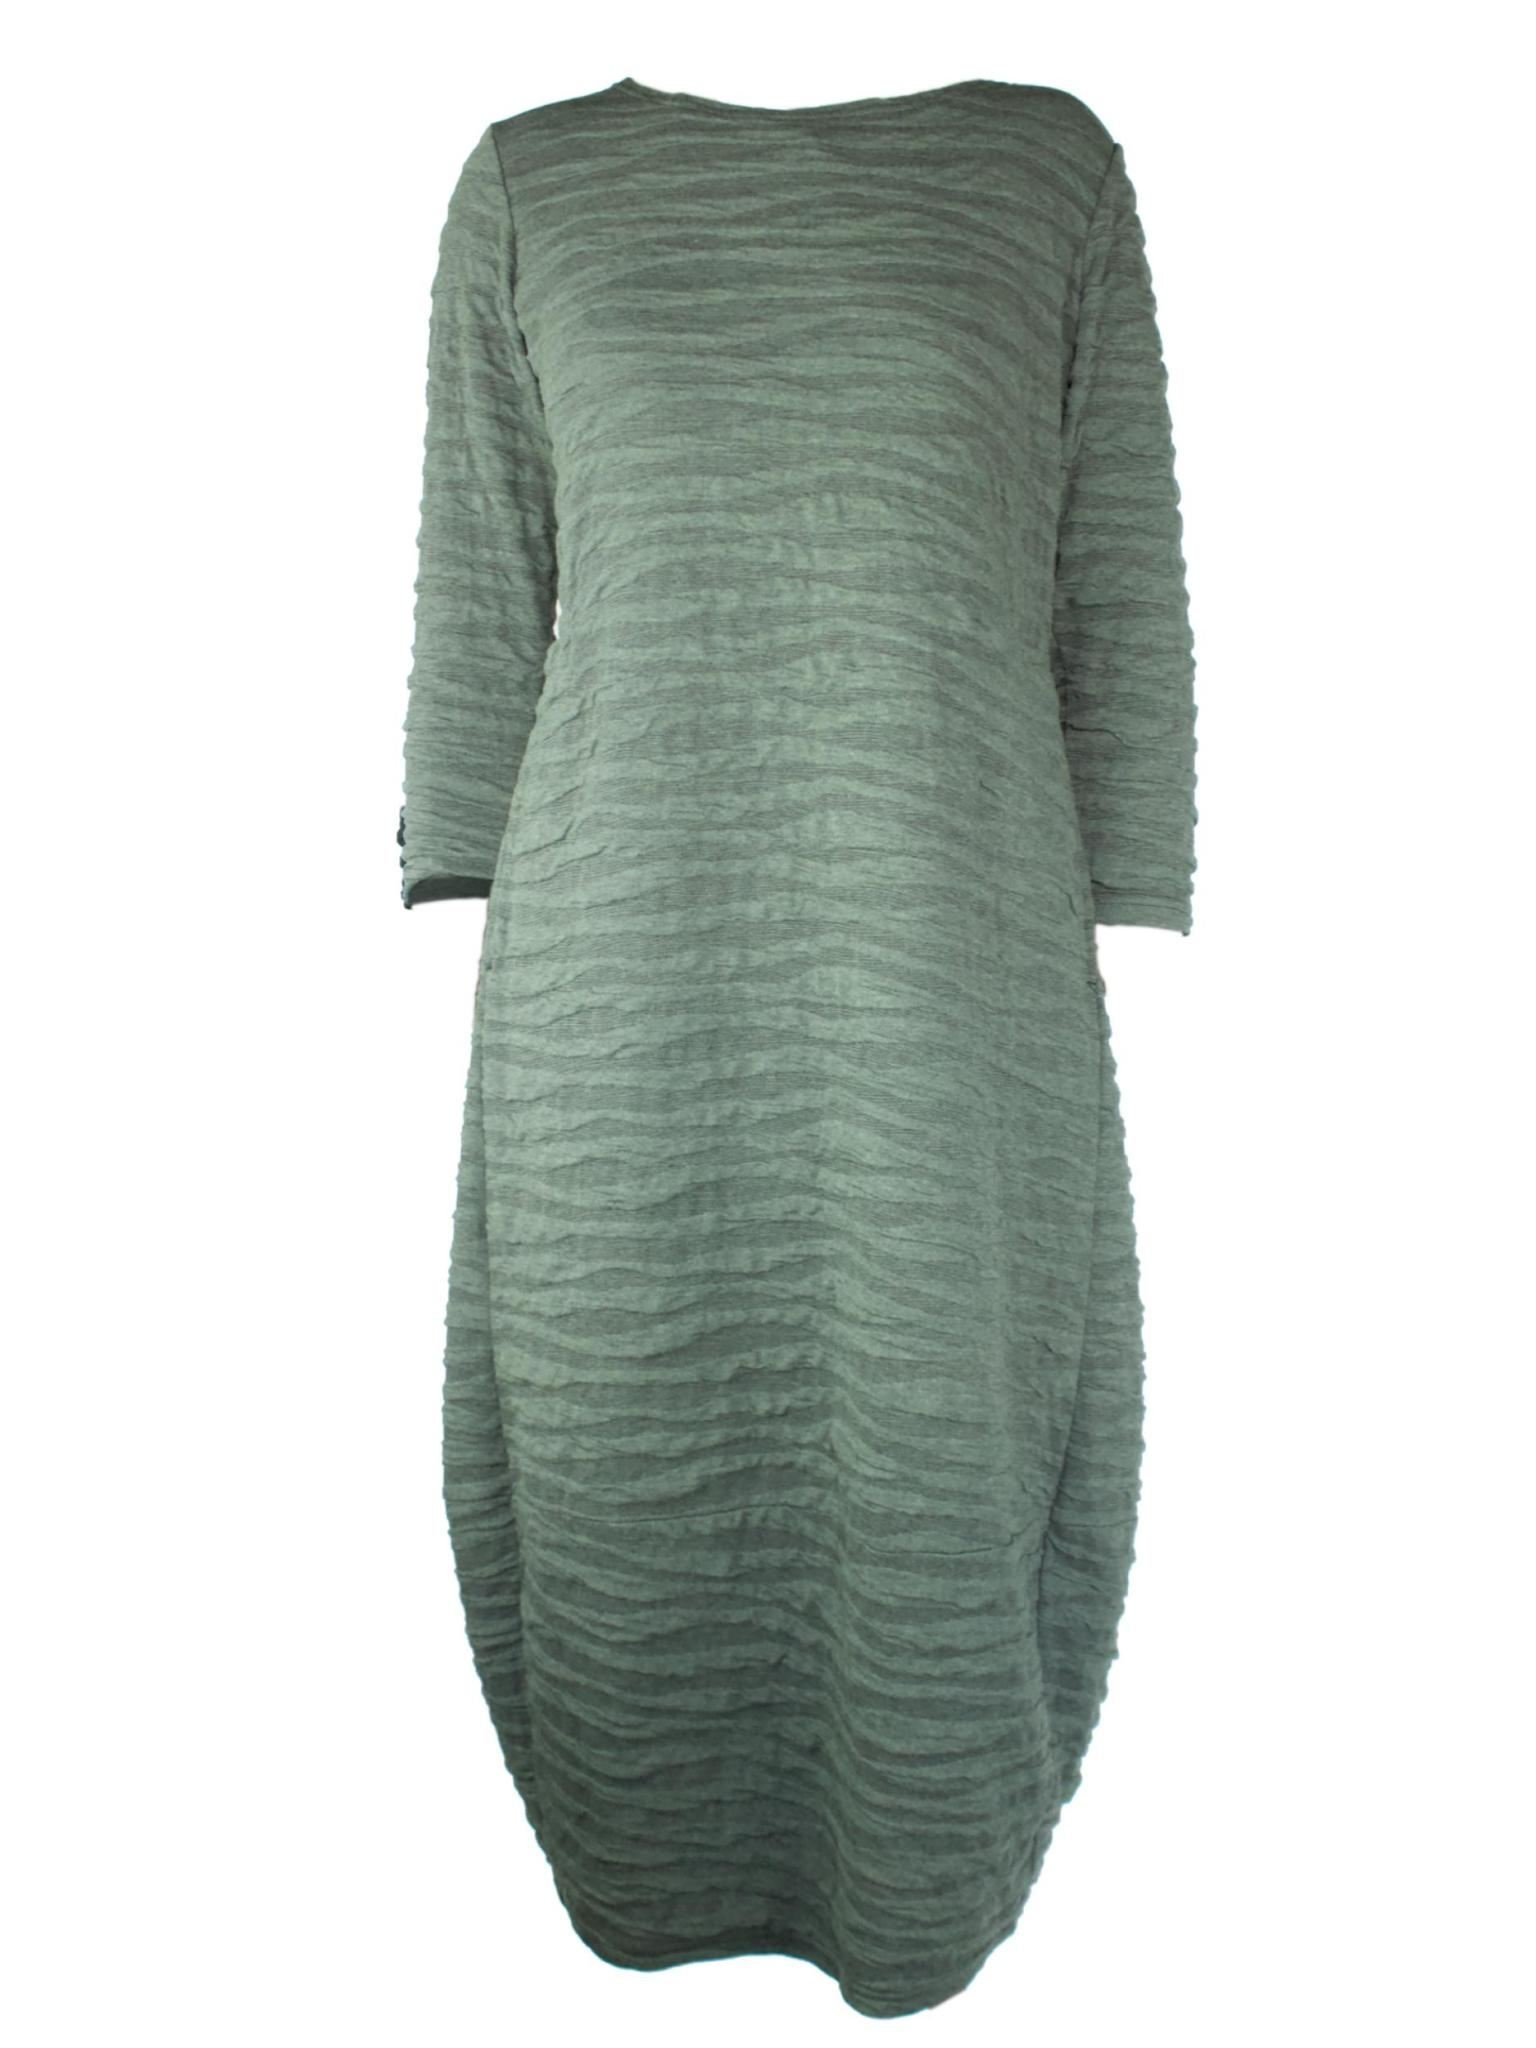 Cut Loose 3/4 Sleeve Textured Dress